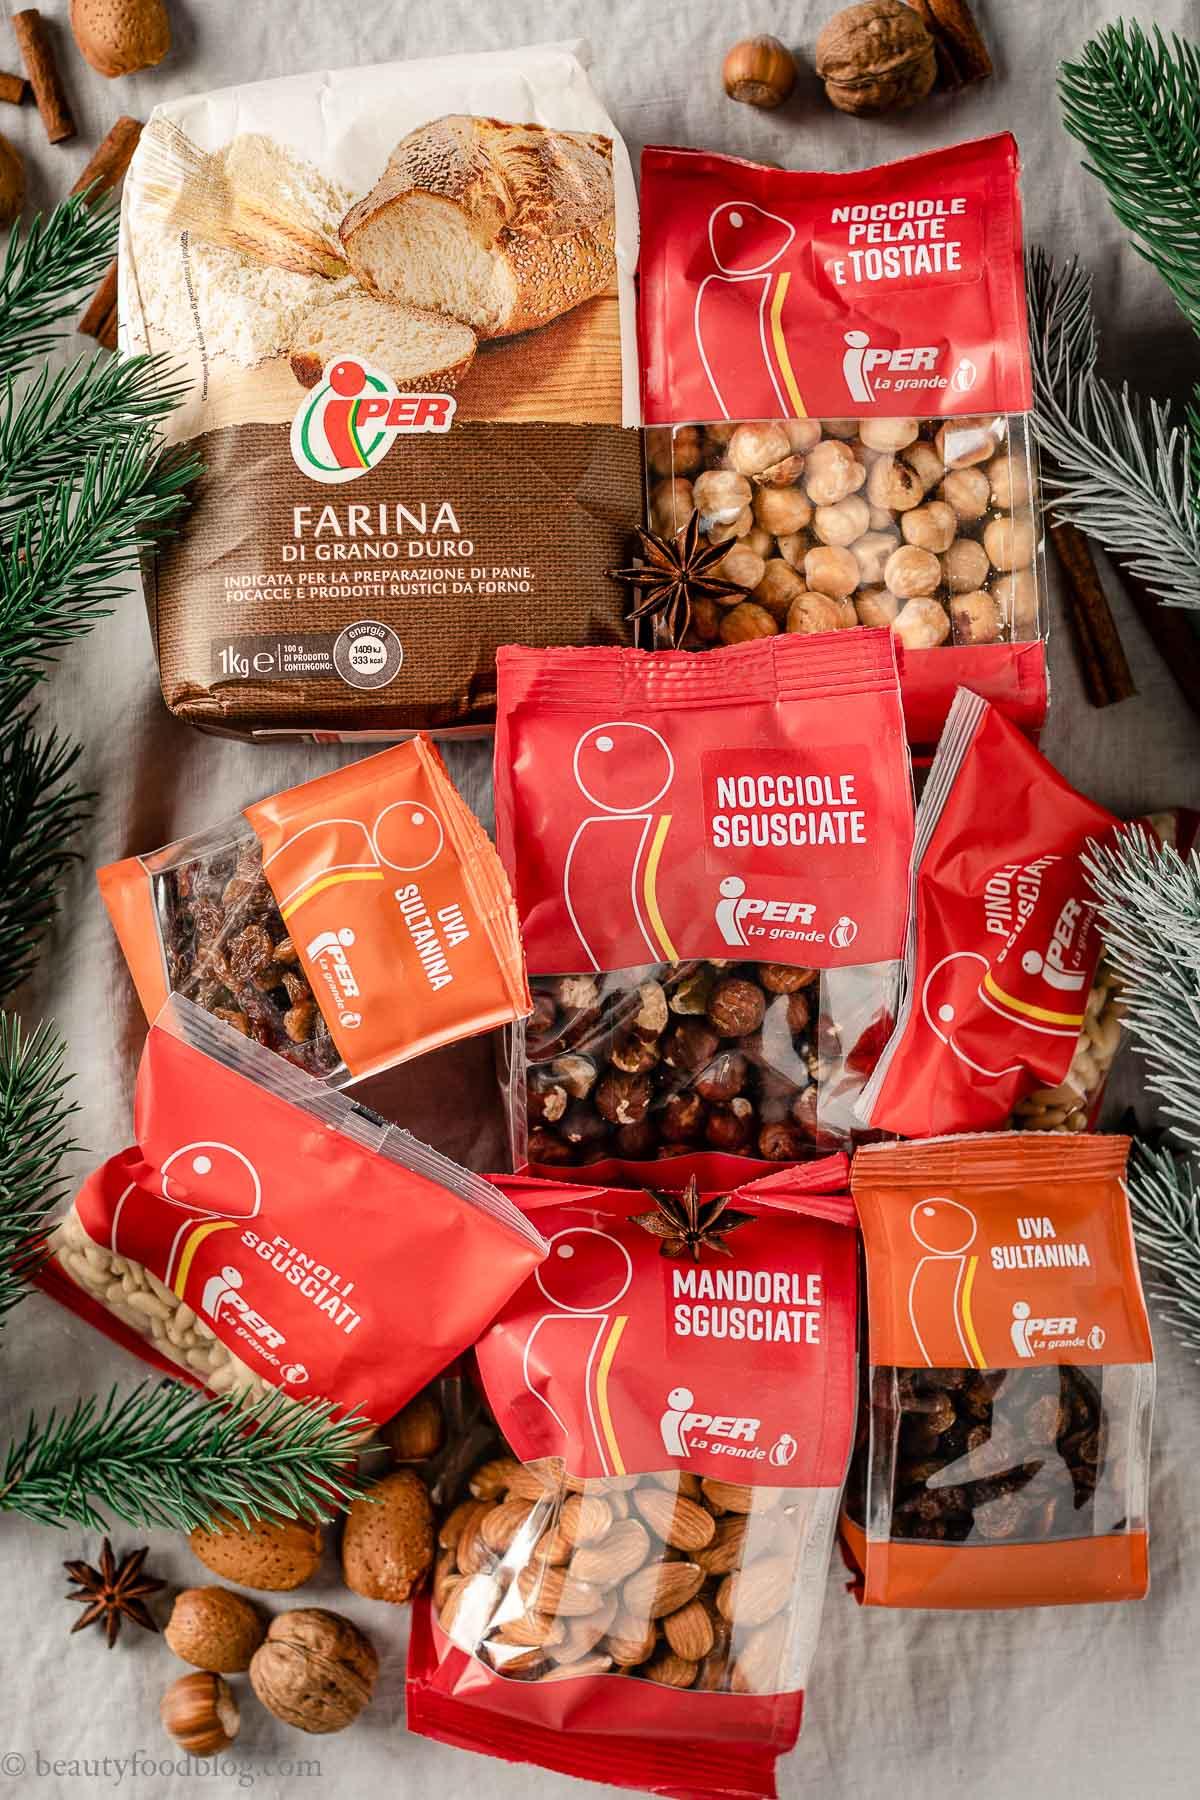 Ricetta Zelten Tirolese Originale Dolce di Natale del SudTirol Iper